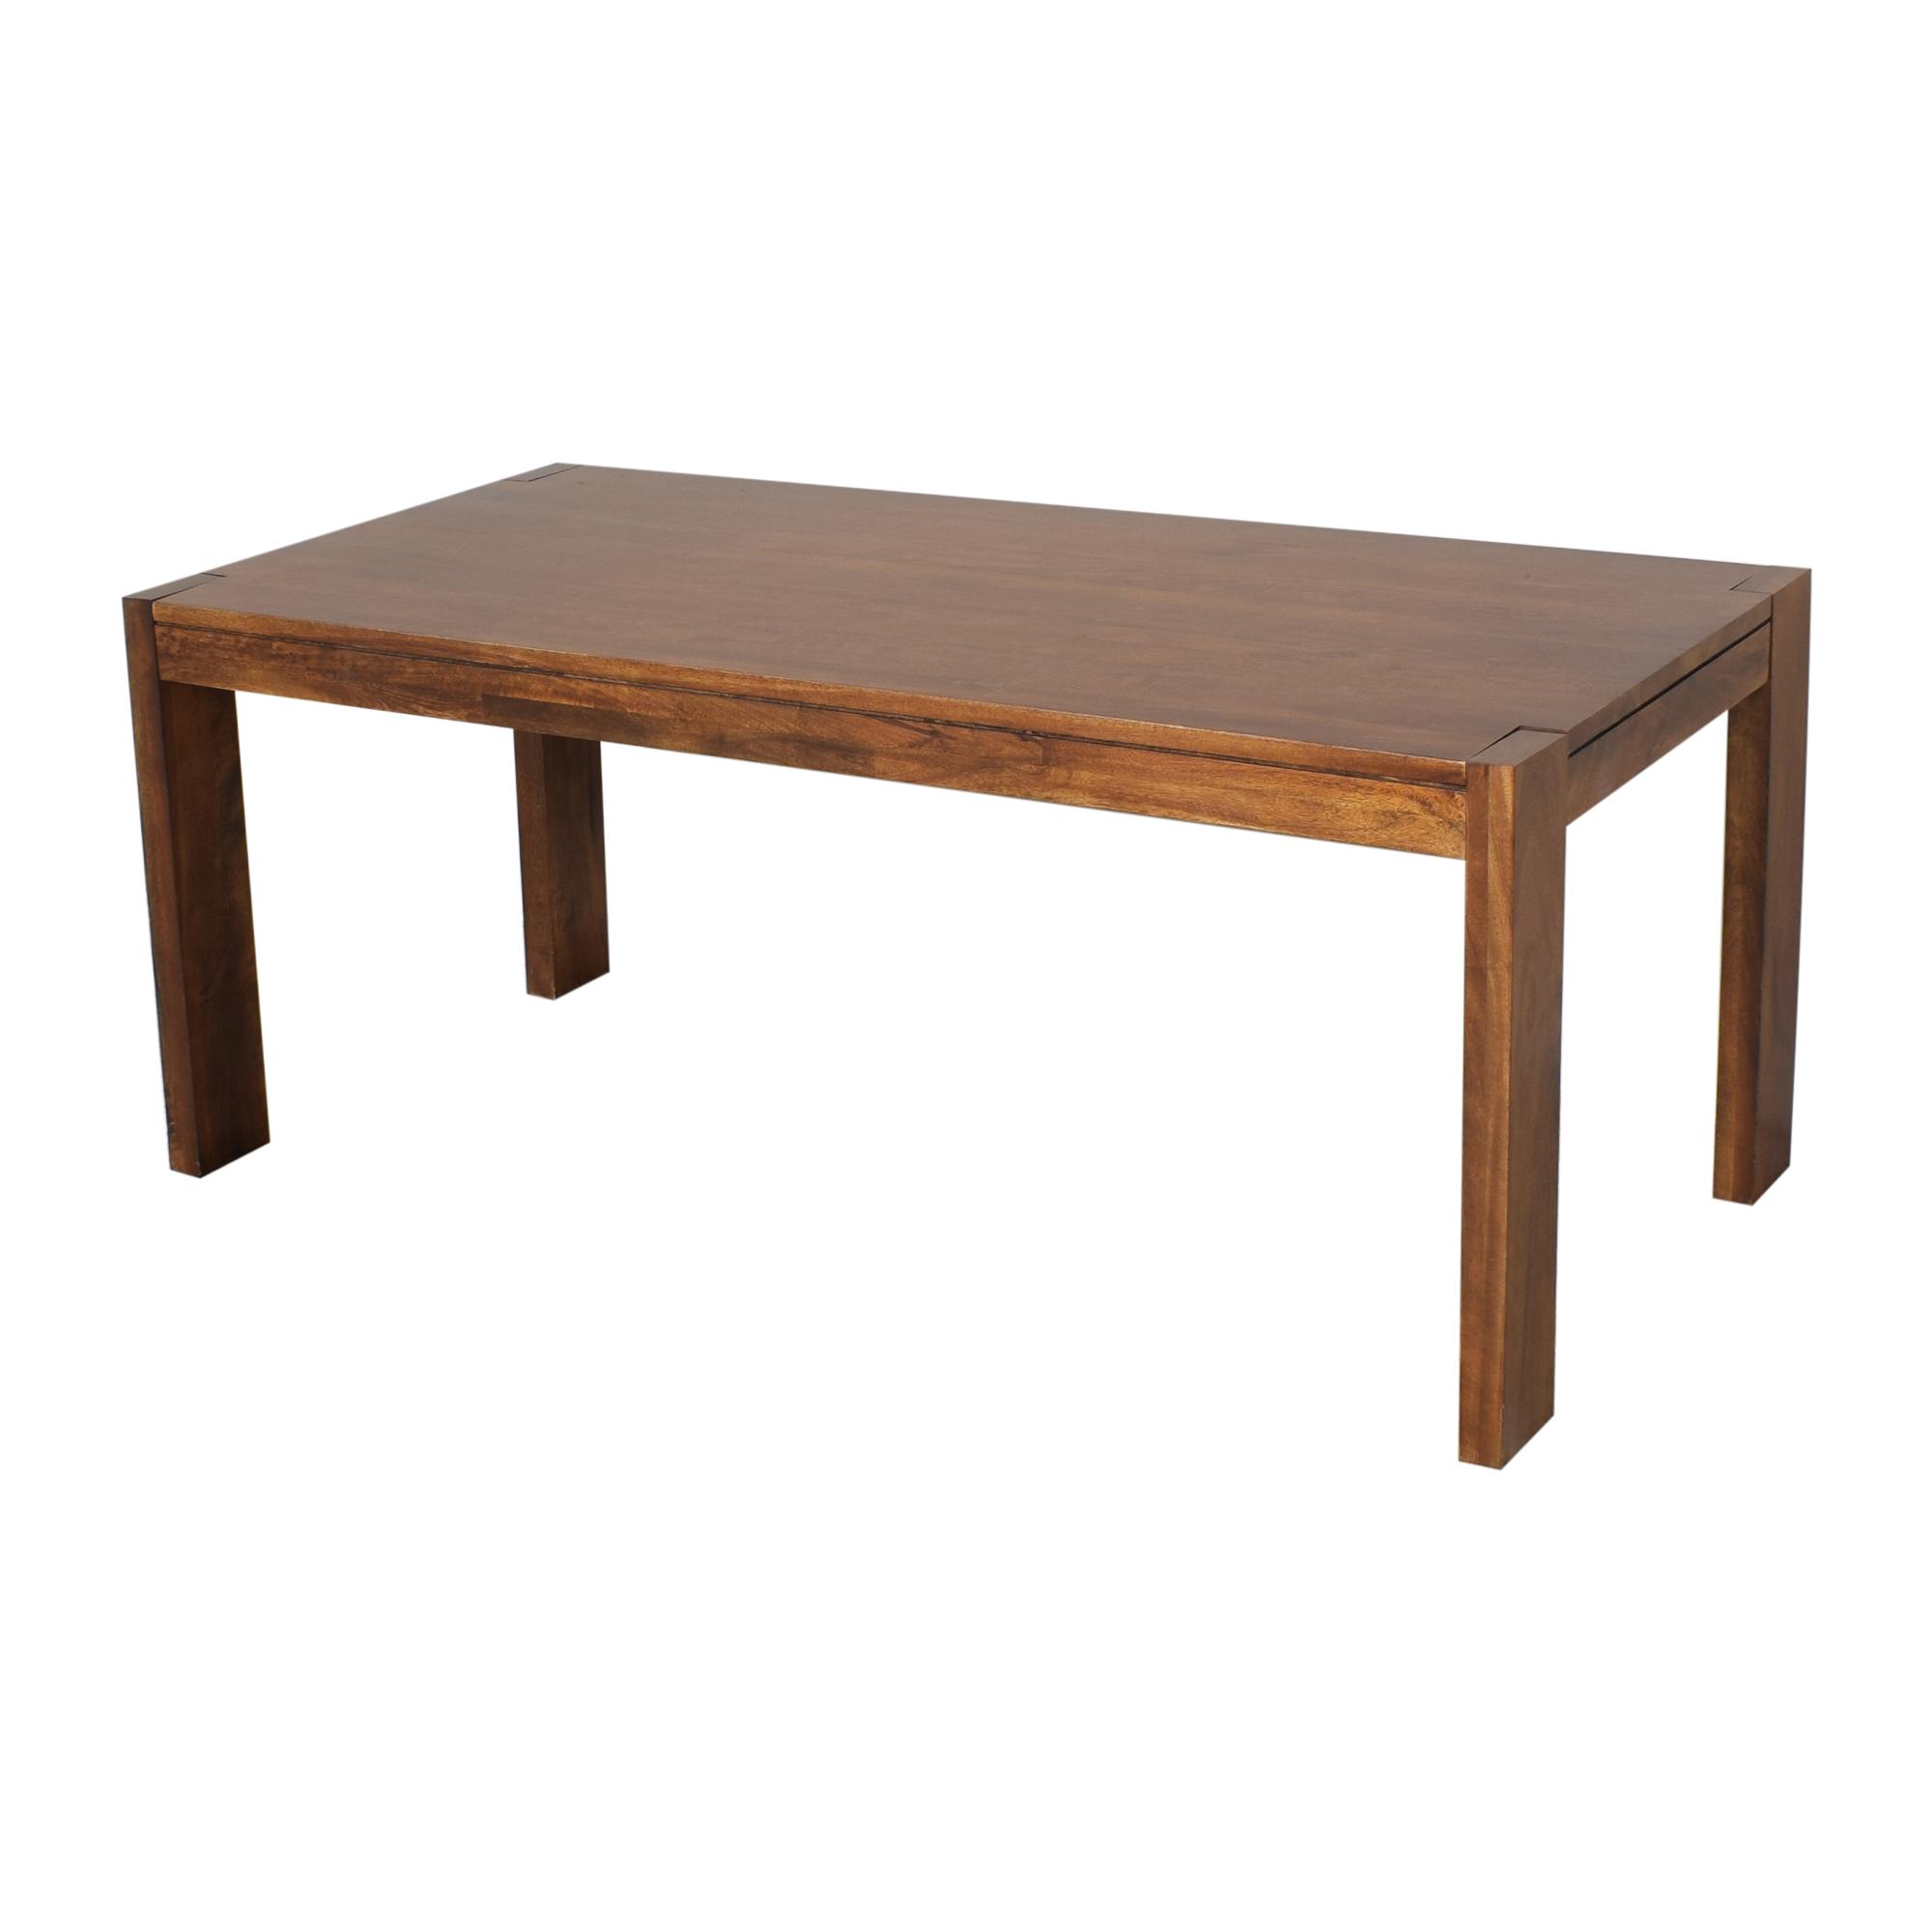 West Elm West Elm Boerum Dining Table on sale